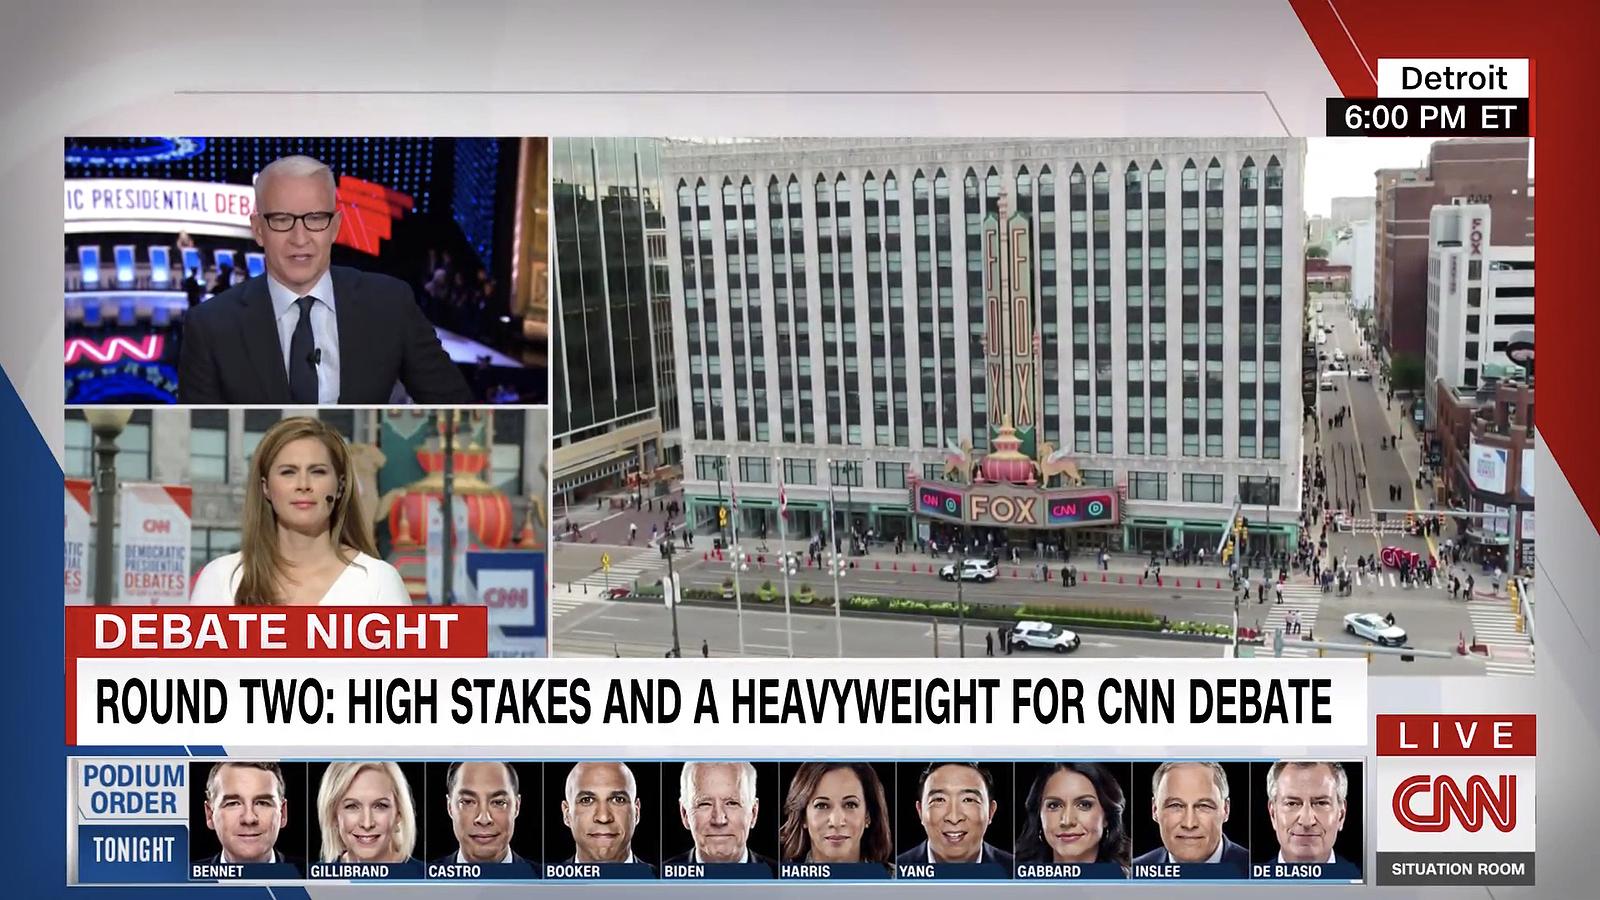 NCS_CNN-Dem-Debate-Cold-Open_Graphics_0022